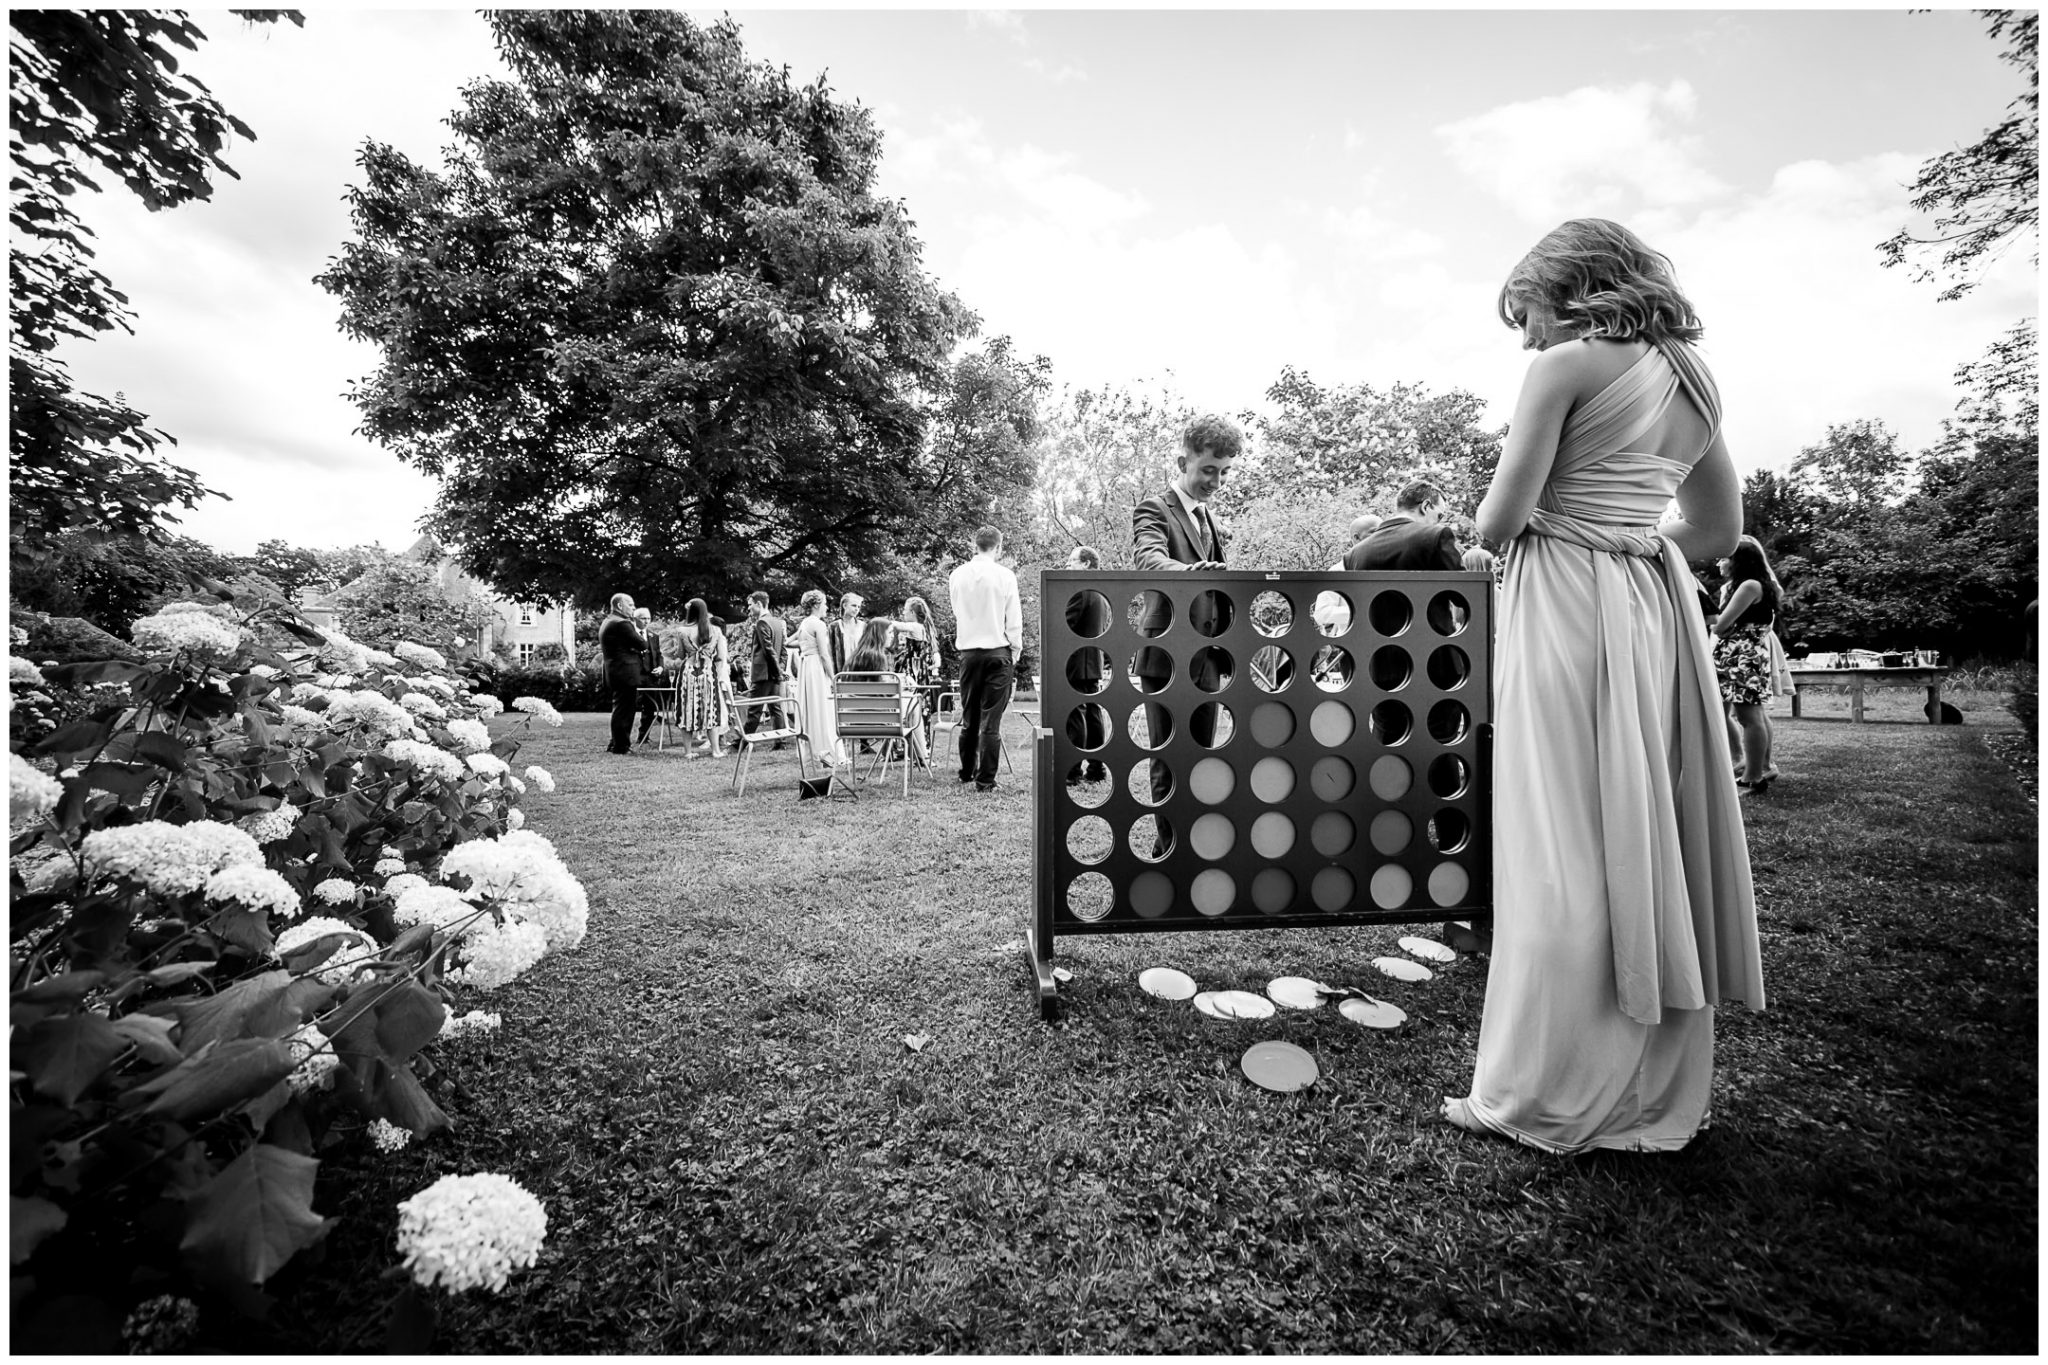 Garden games during the reception